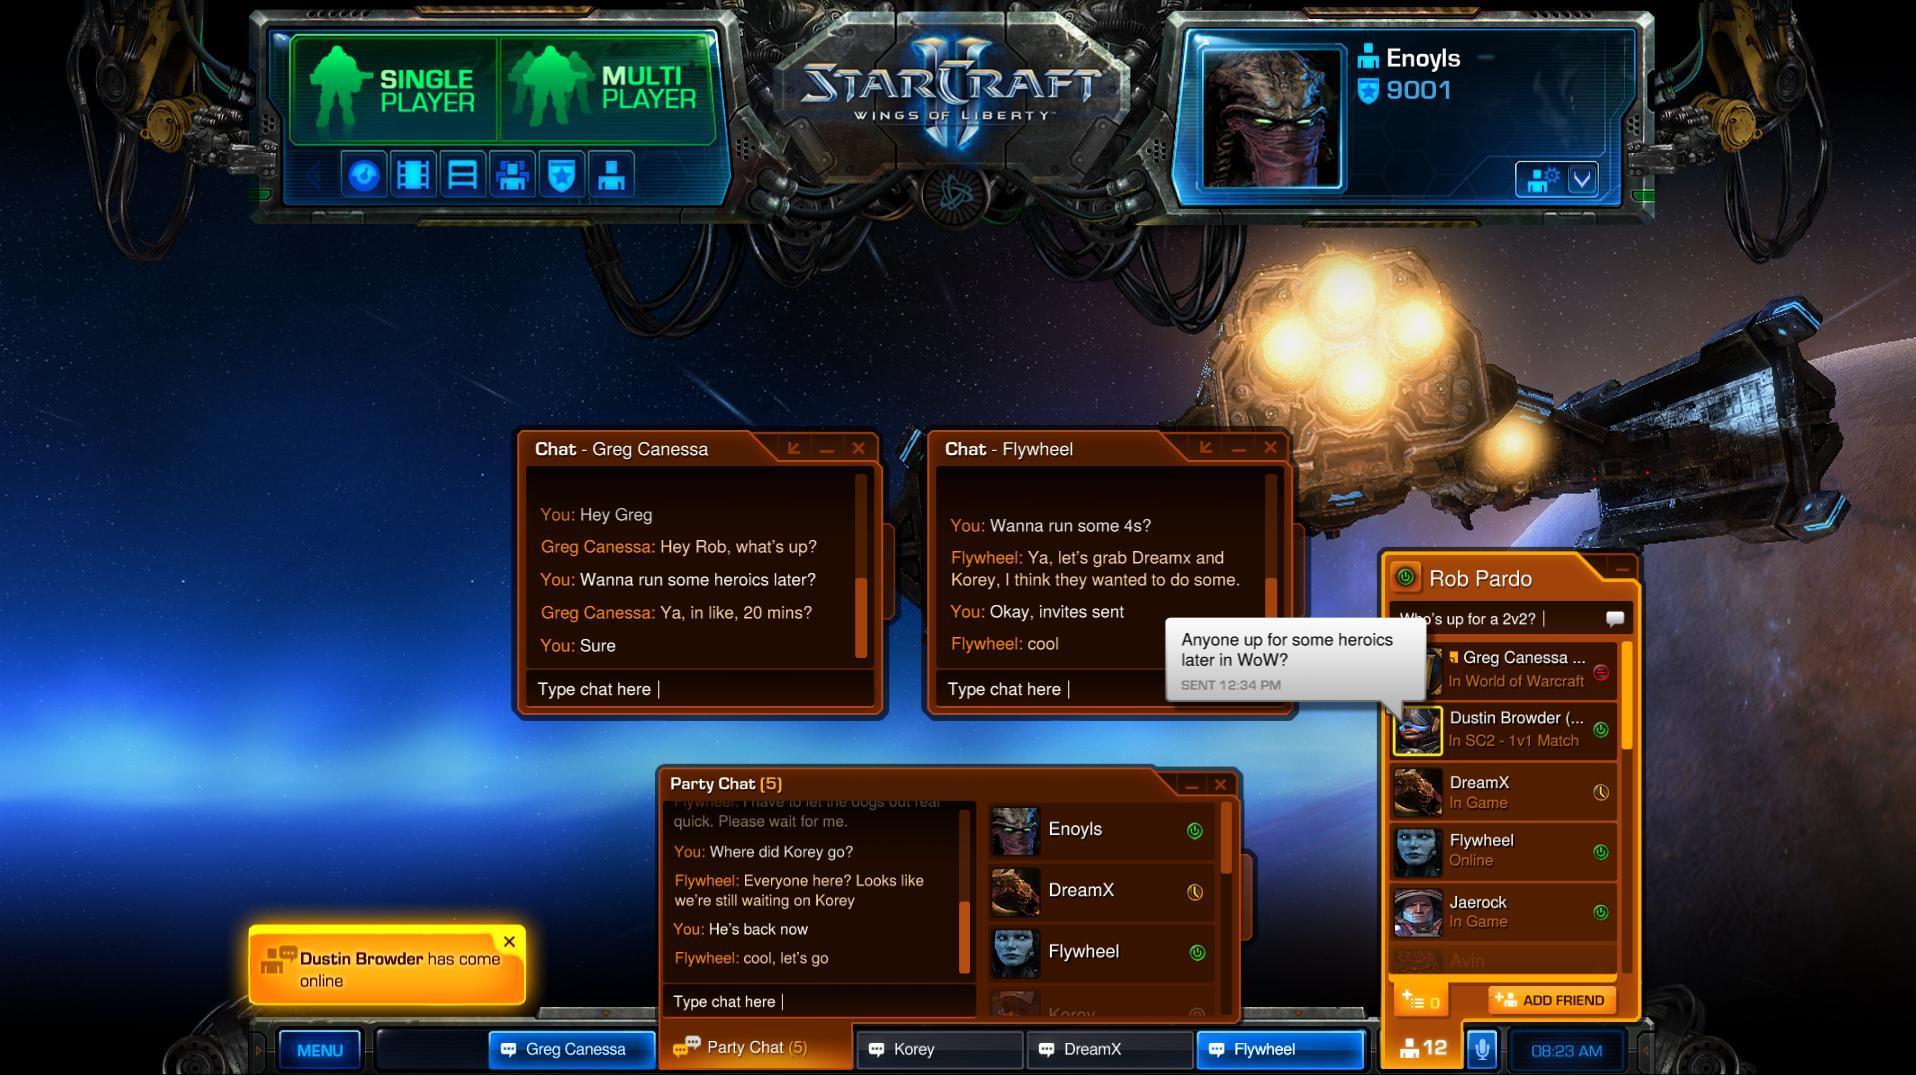 StarCraft 2 Wings of Liberty - скриншот из игры.